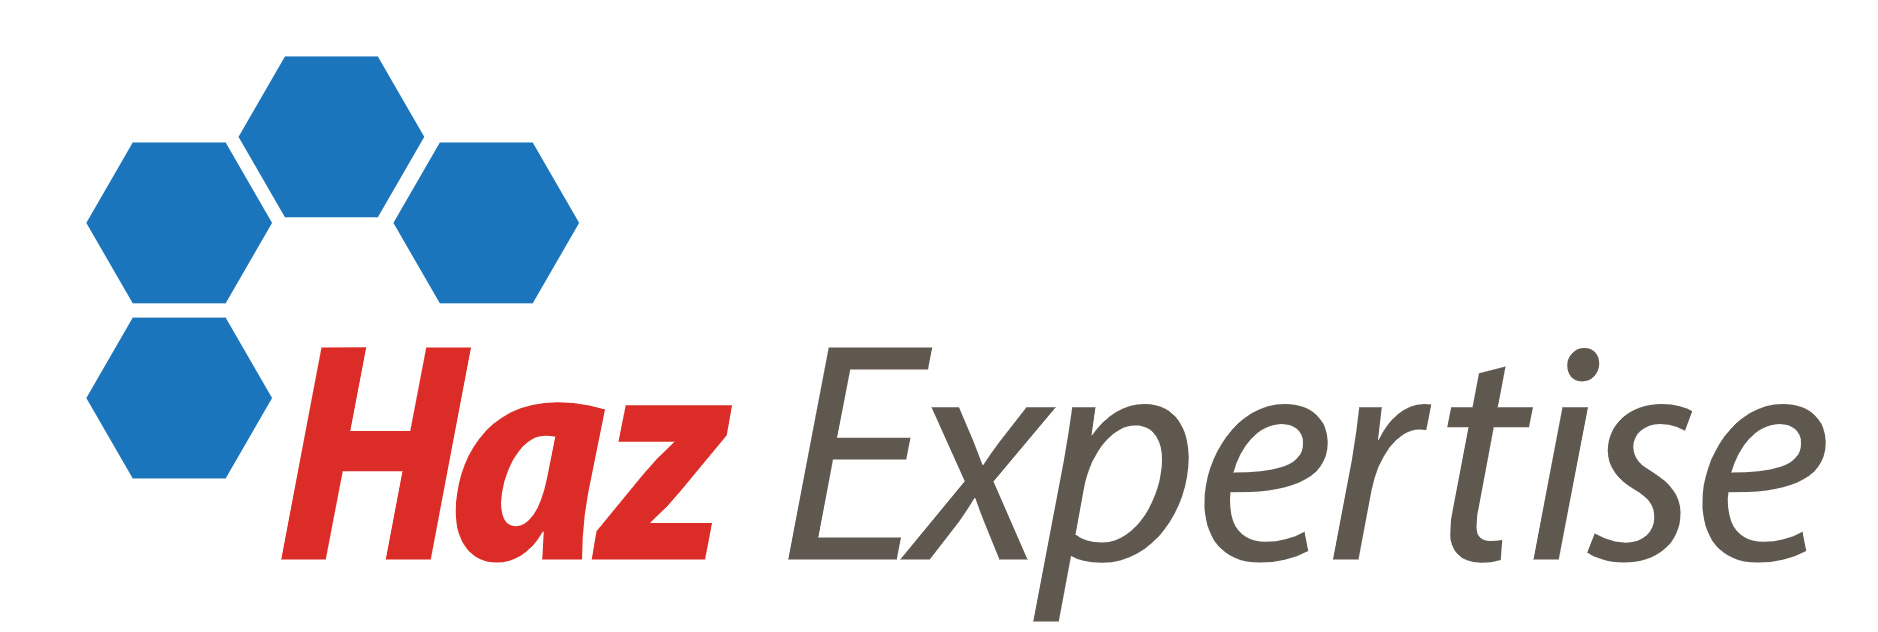 haz expertise